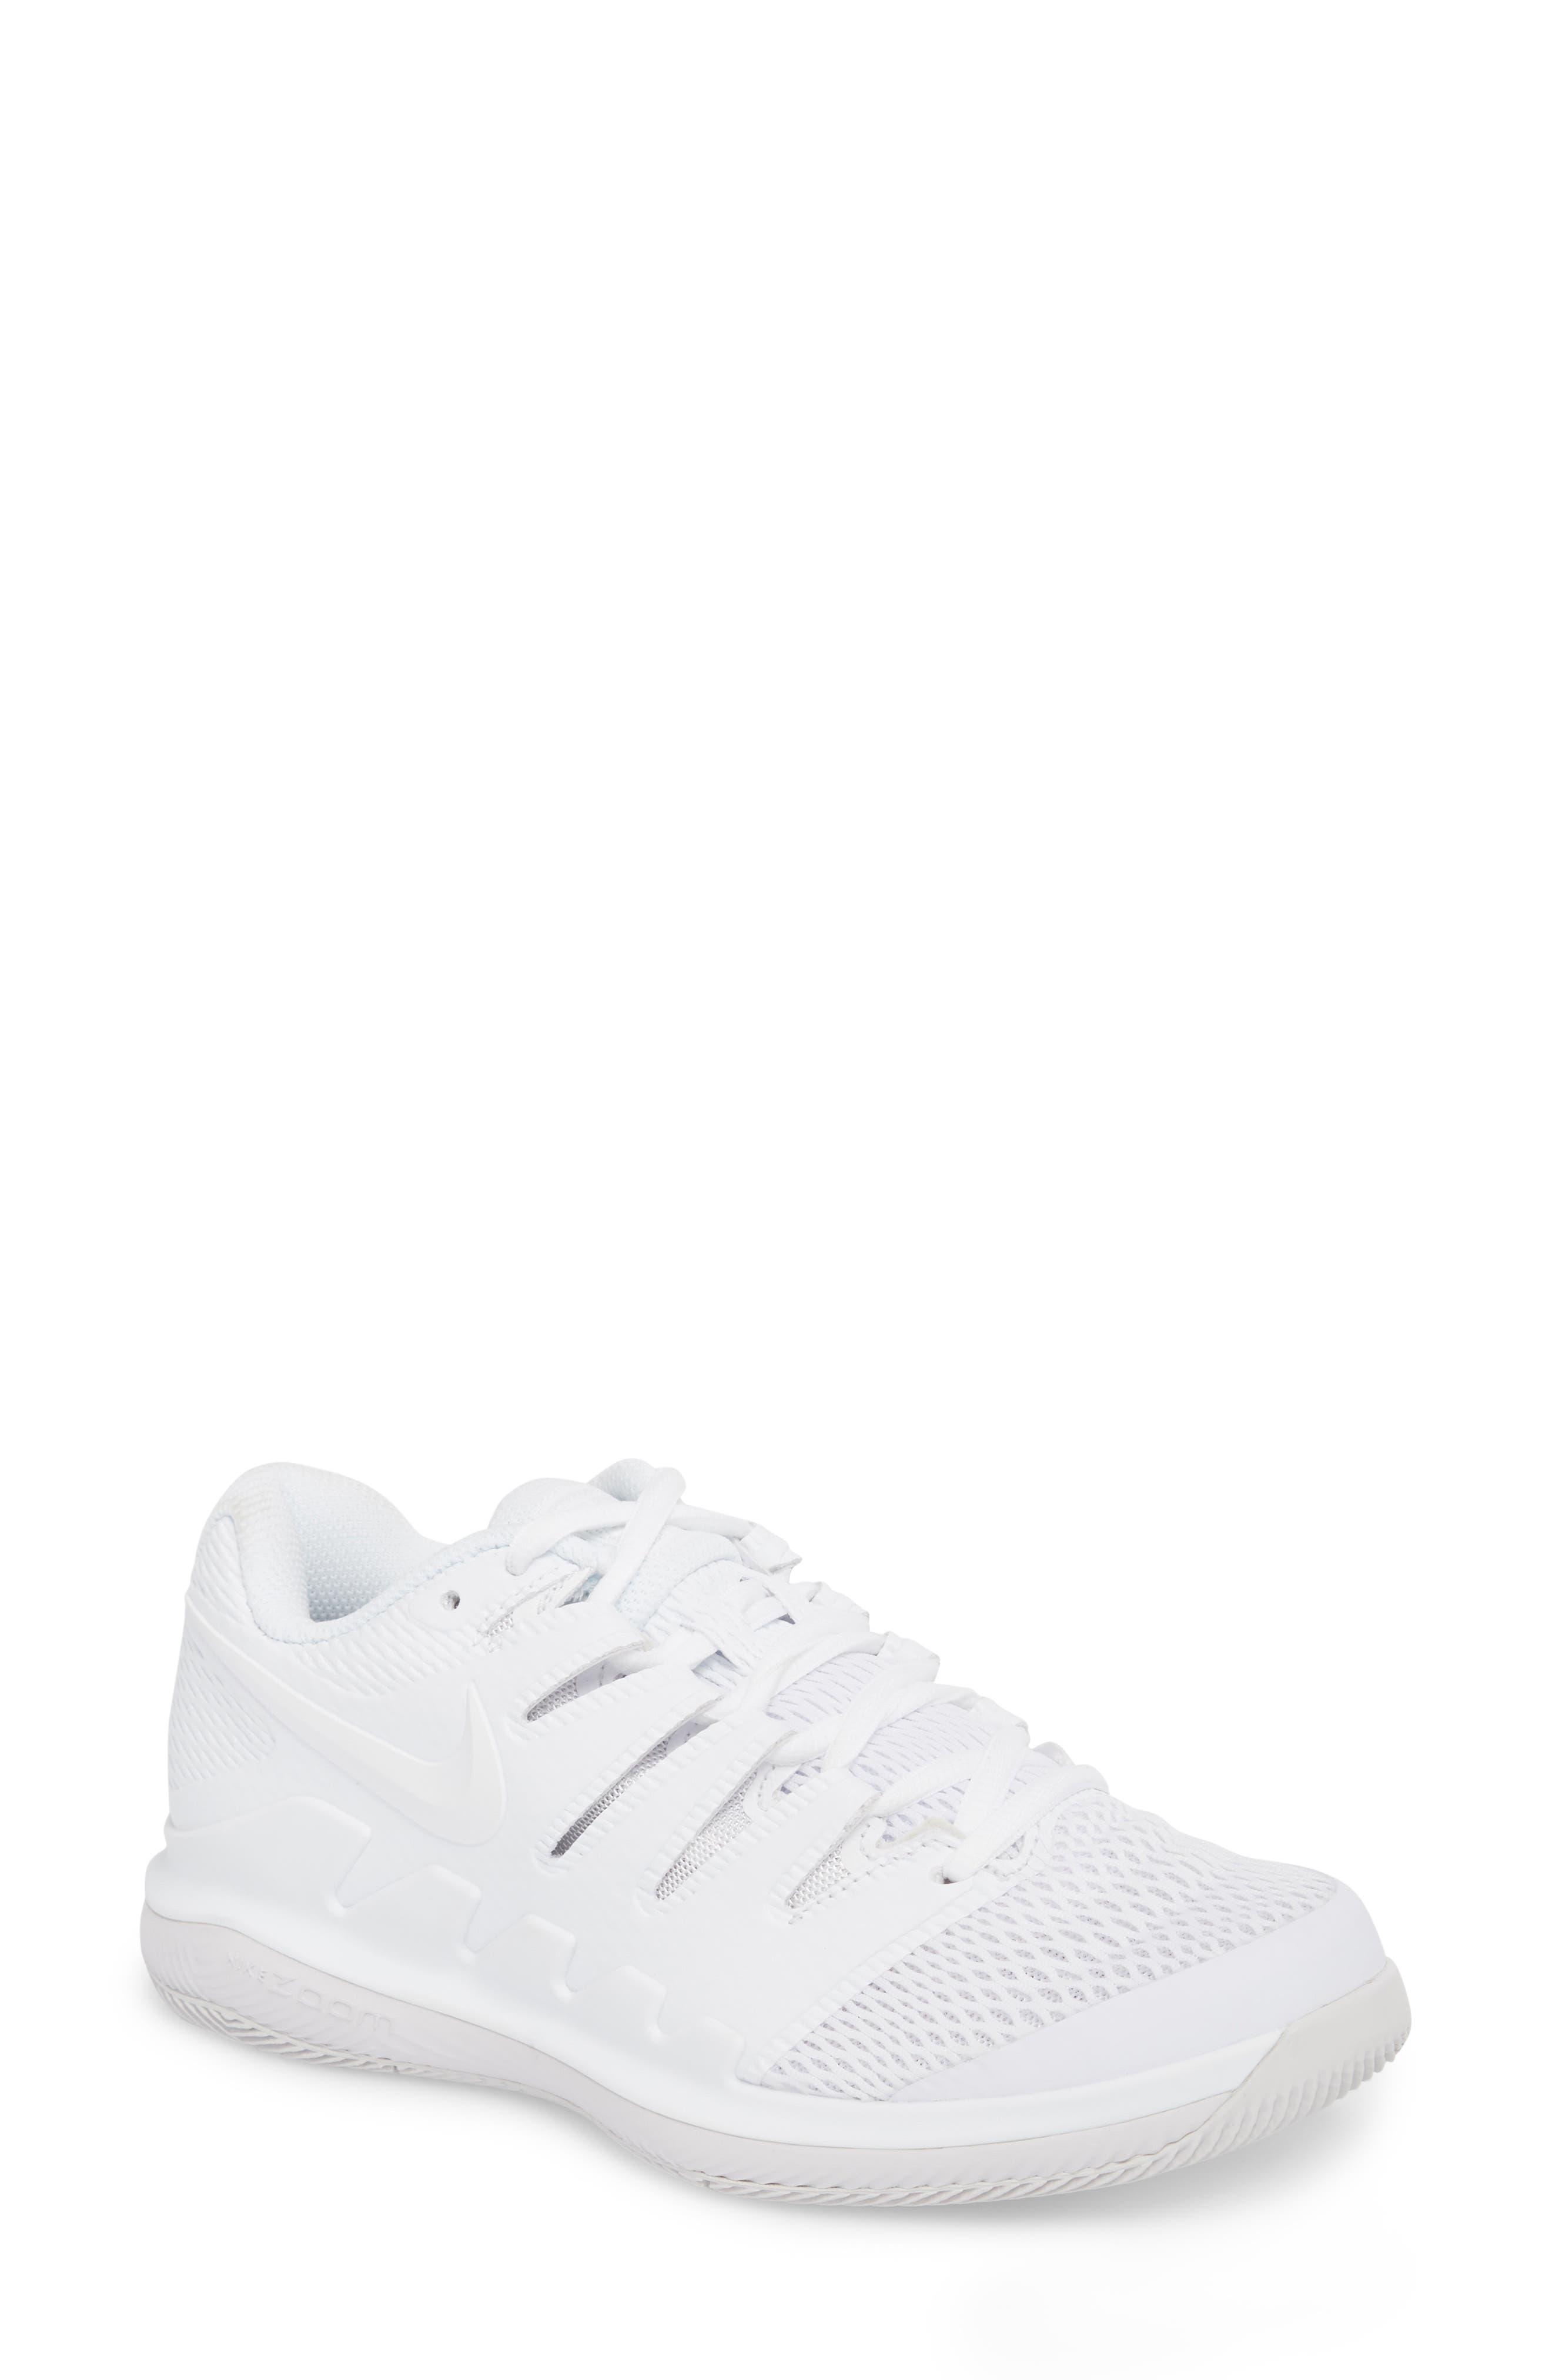 Air Zoom Vapor X Tennis Shoe,                             Main thumbnail 1, color,                             WHITE/ WHITE/ VAST GREY